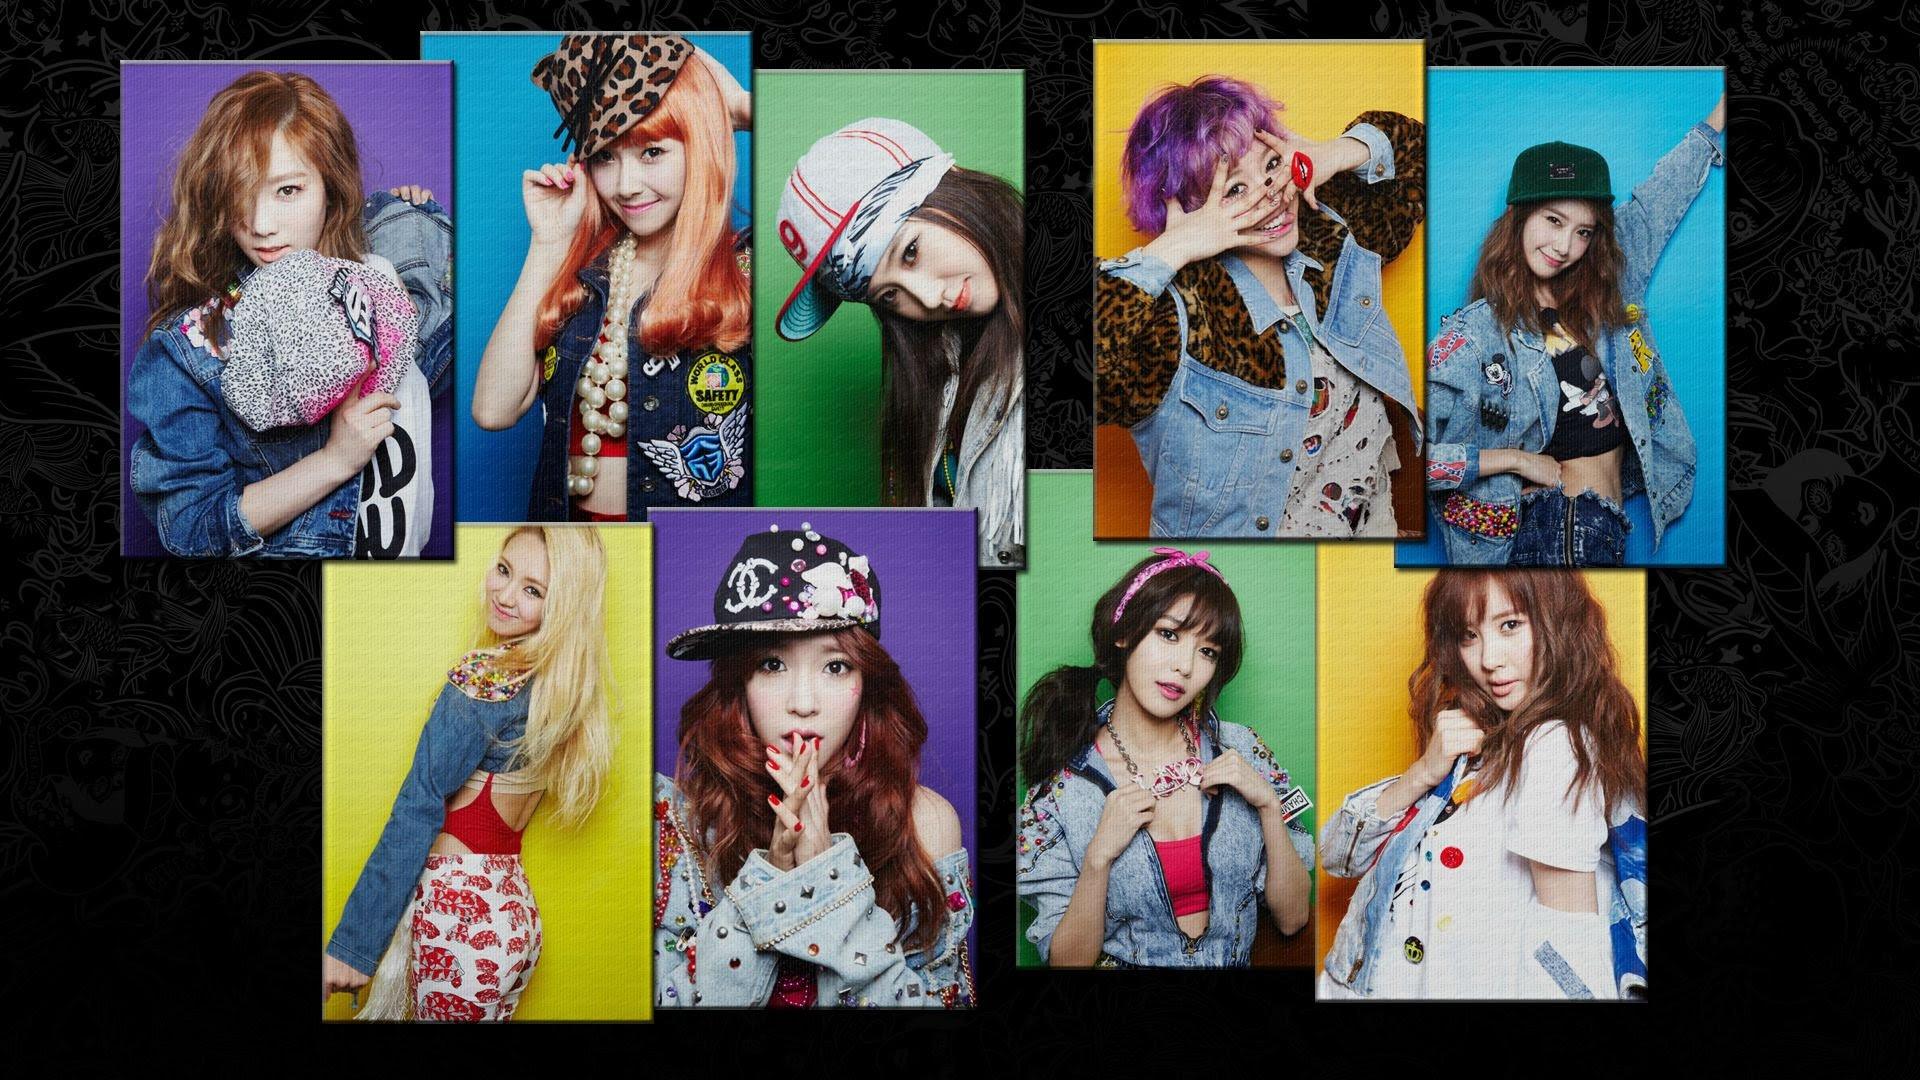 Hd Wallpaper Hd Pc Kpop Wallpaper Pemandangan